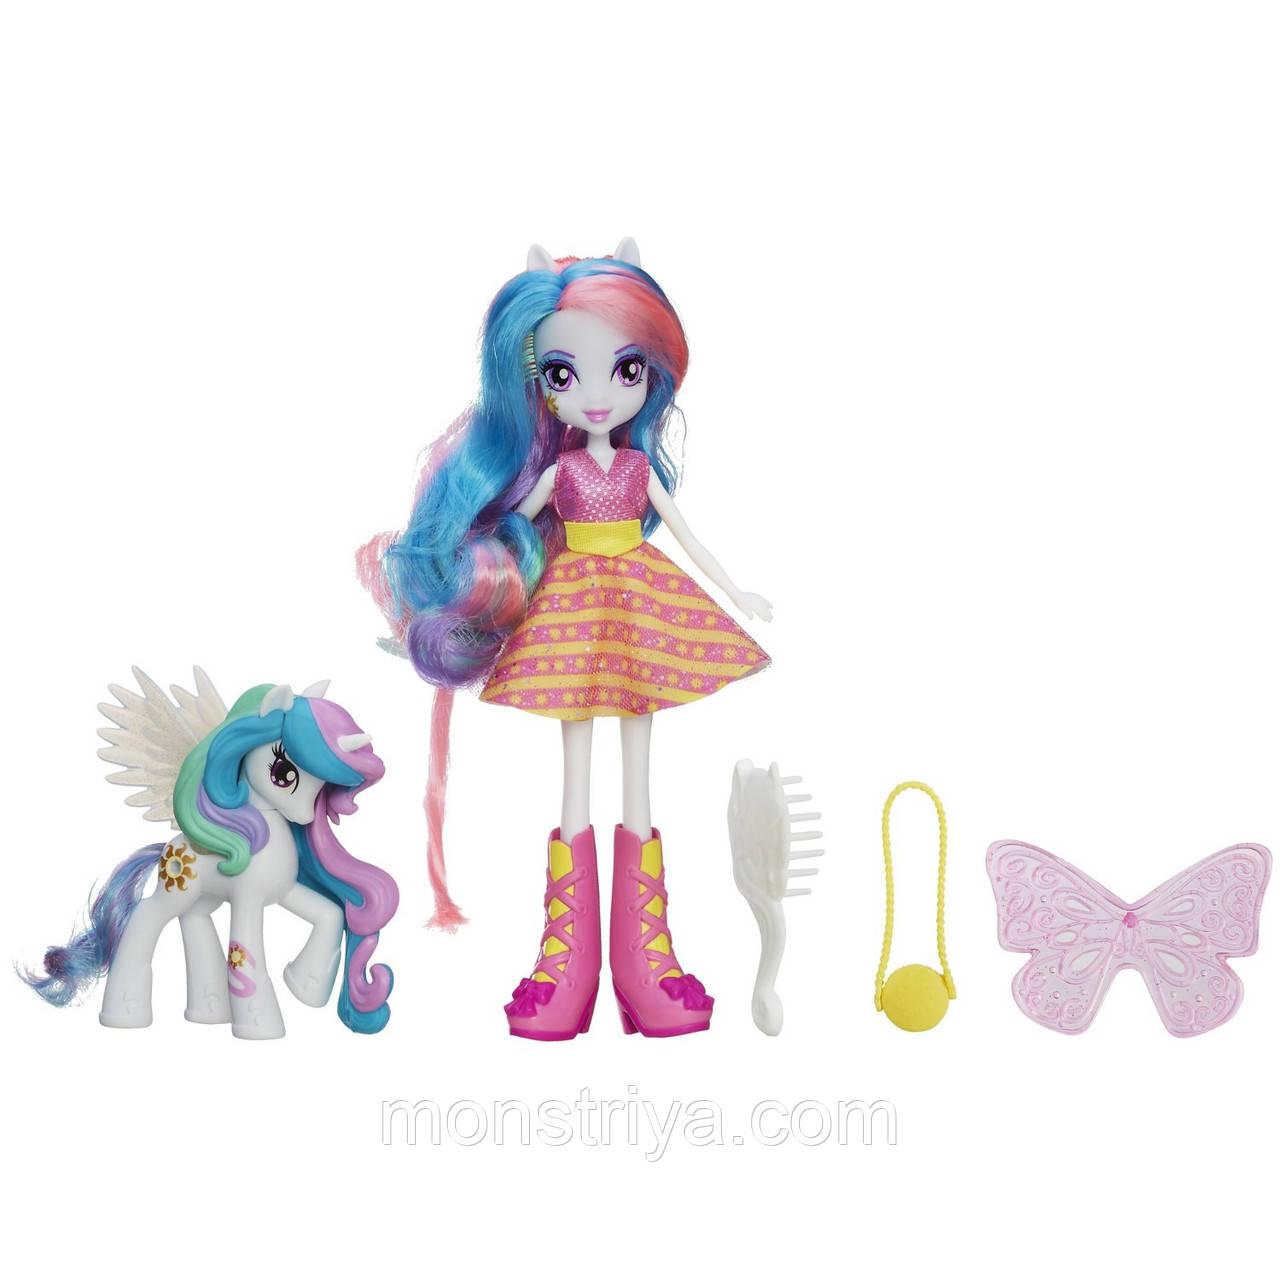 Набор кукла и пони Celestia, My Little Pony Equestria Girls (Девушки Эквестрии) от Hasbro